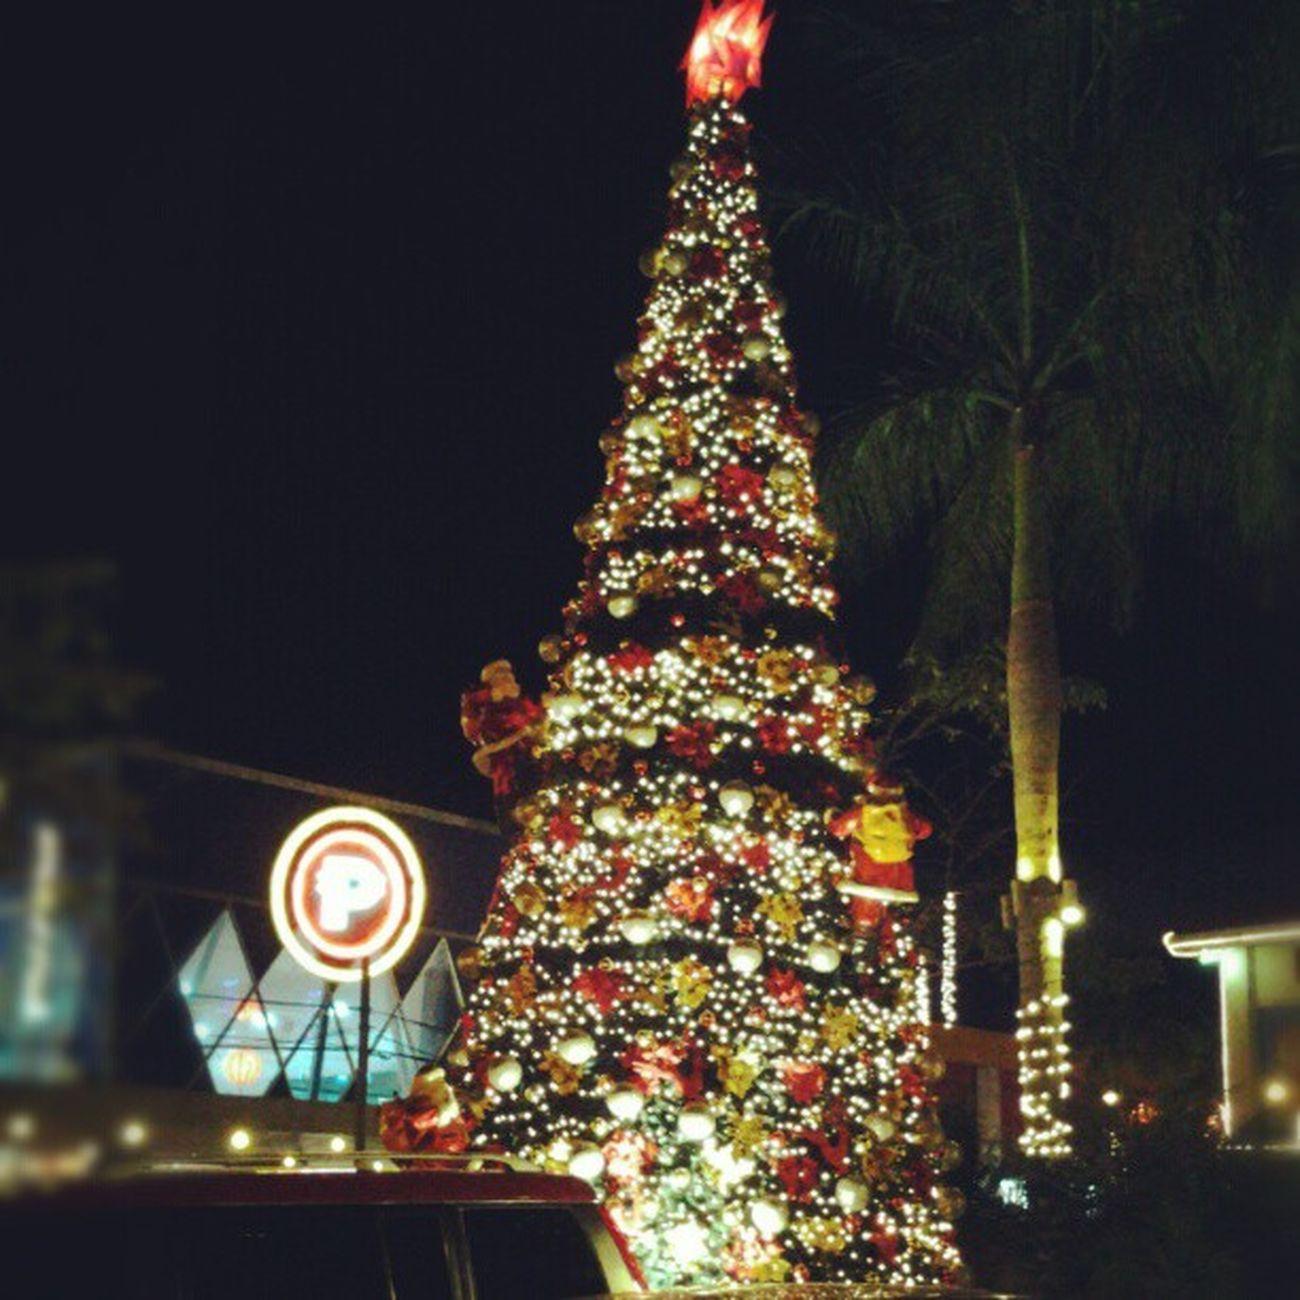 Palo cebo christmas version Santaracetothetop